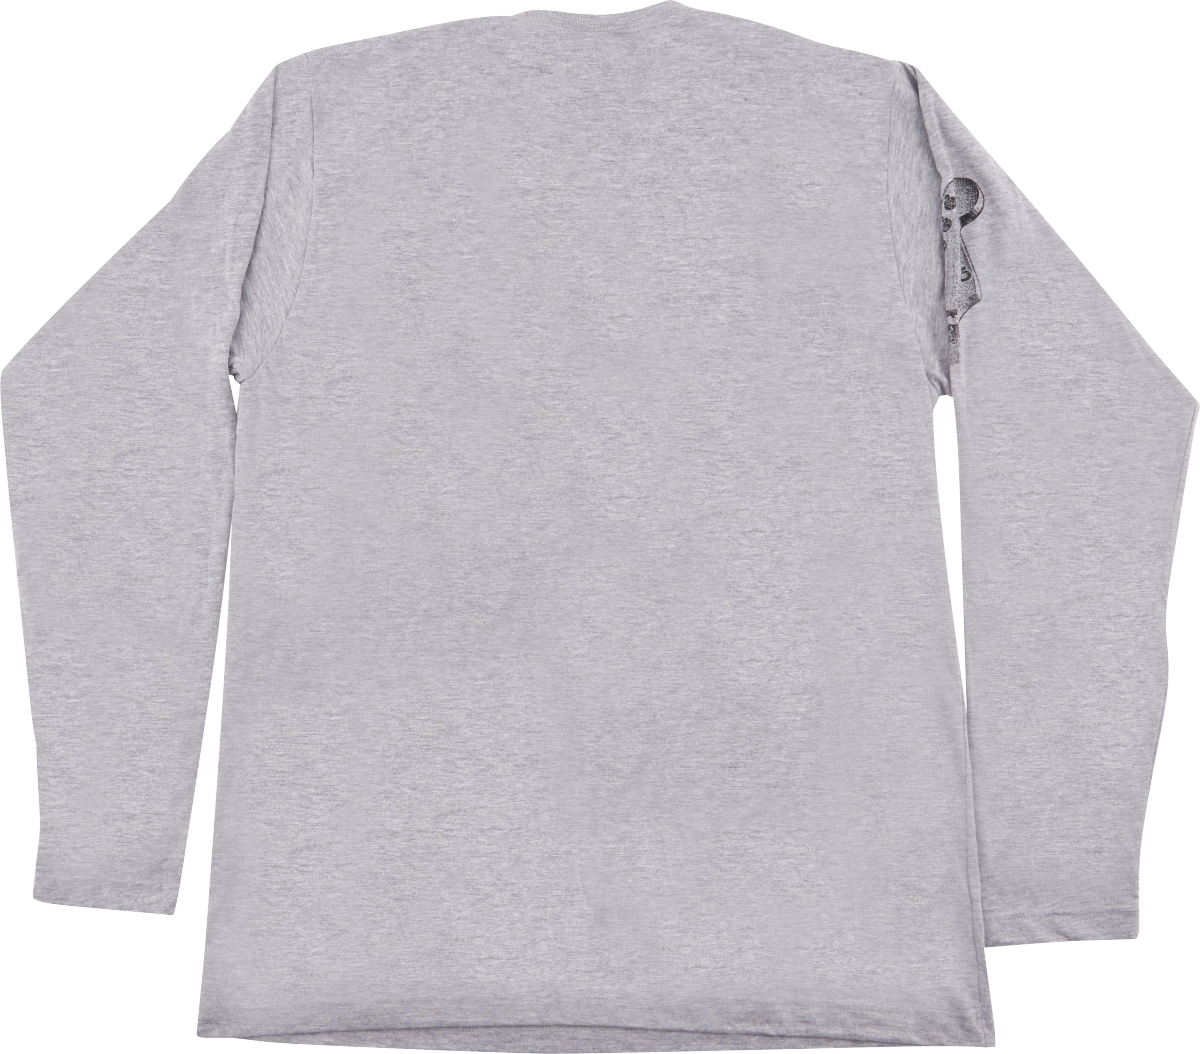 Charvel Charvel® Headstock Long Sleeve T-Shirt, Gray, XL